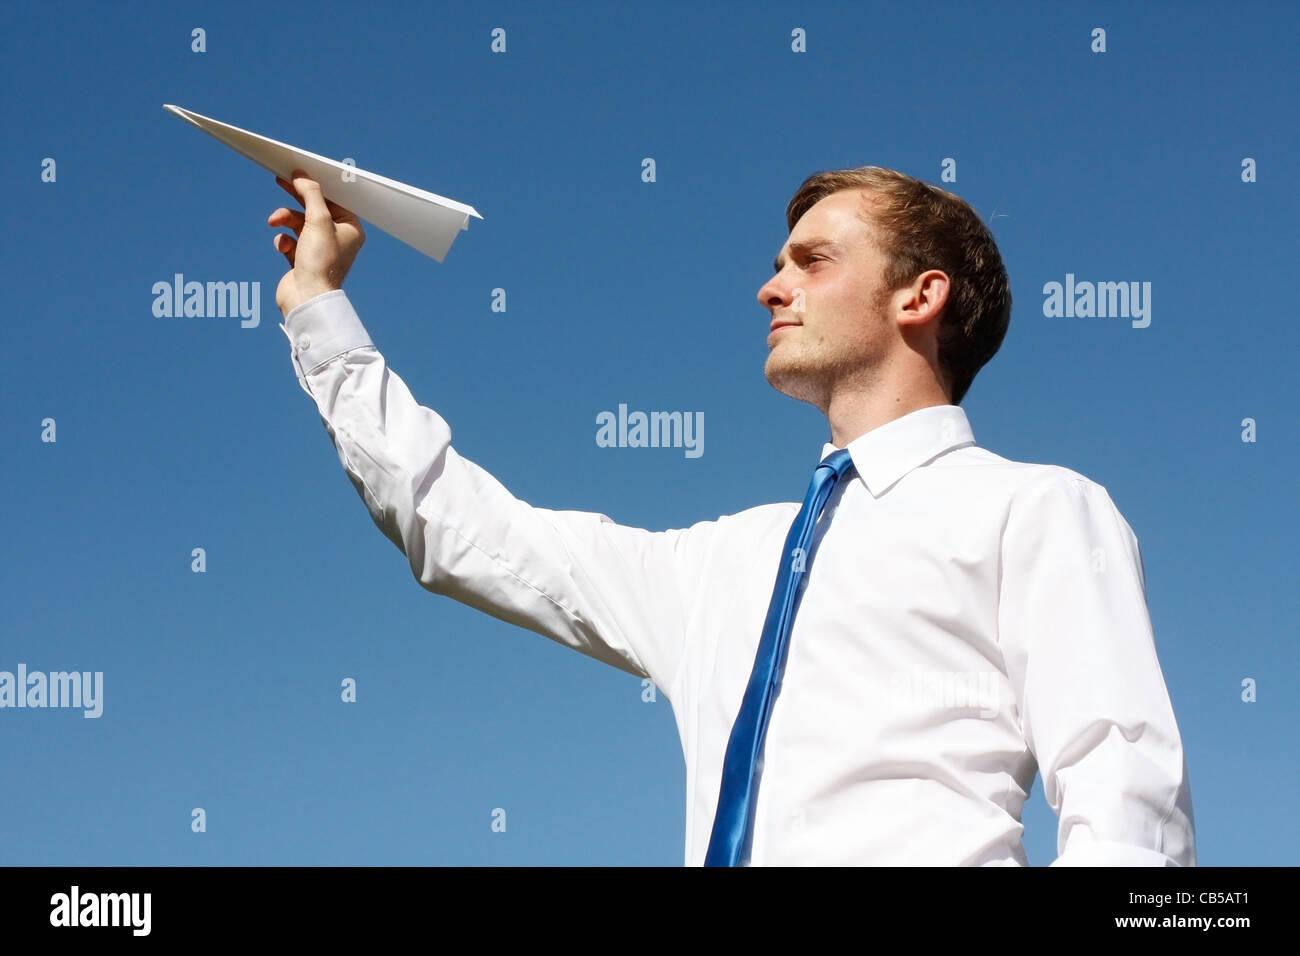 Un hombre de negocios lanzando un avión de papel Imagen De Stock